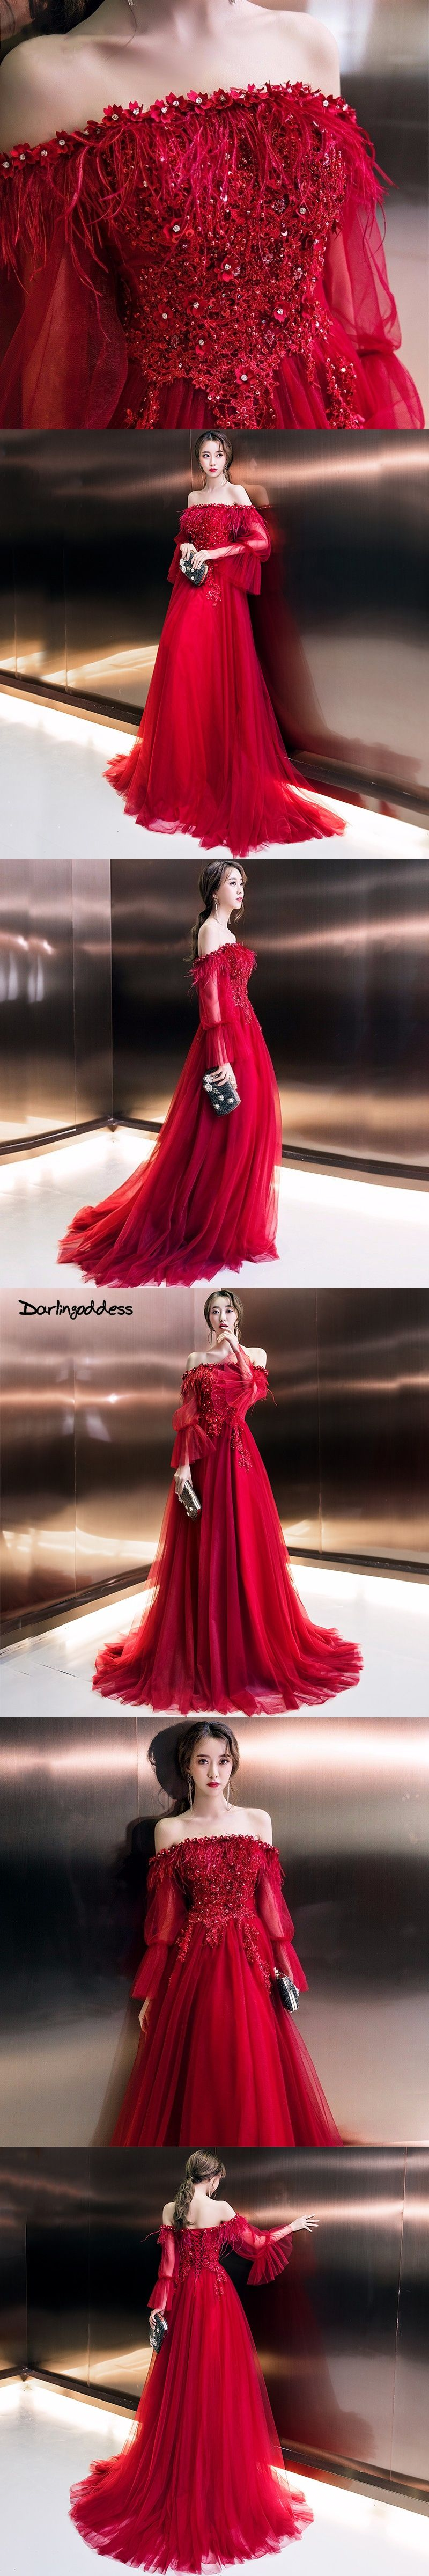 Darlingoddess vestido de festa luxury feather long evening dress